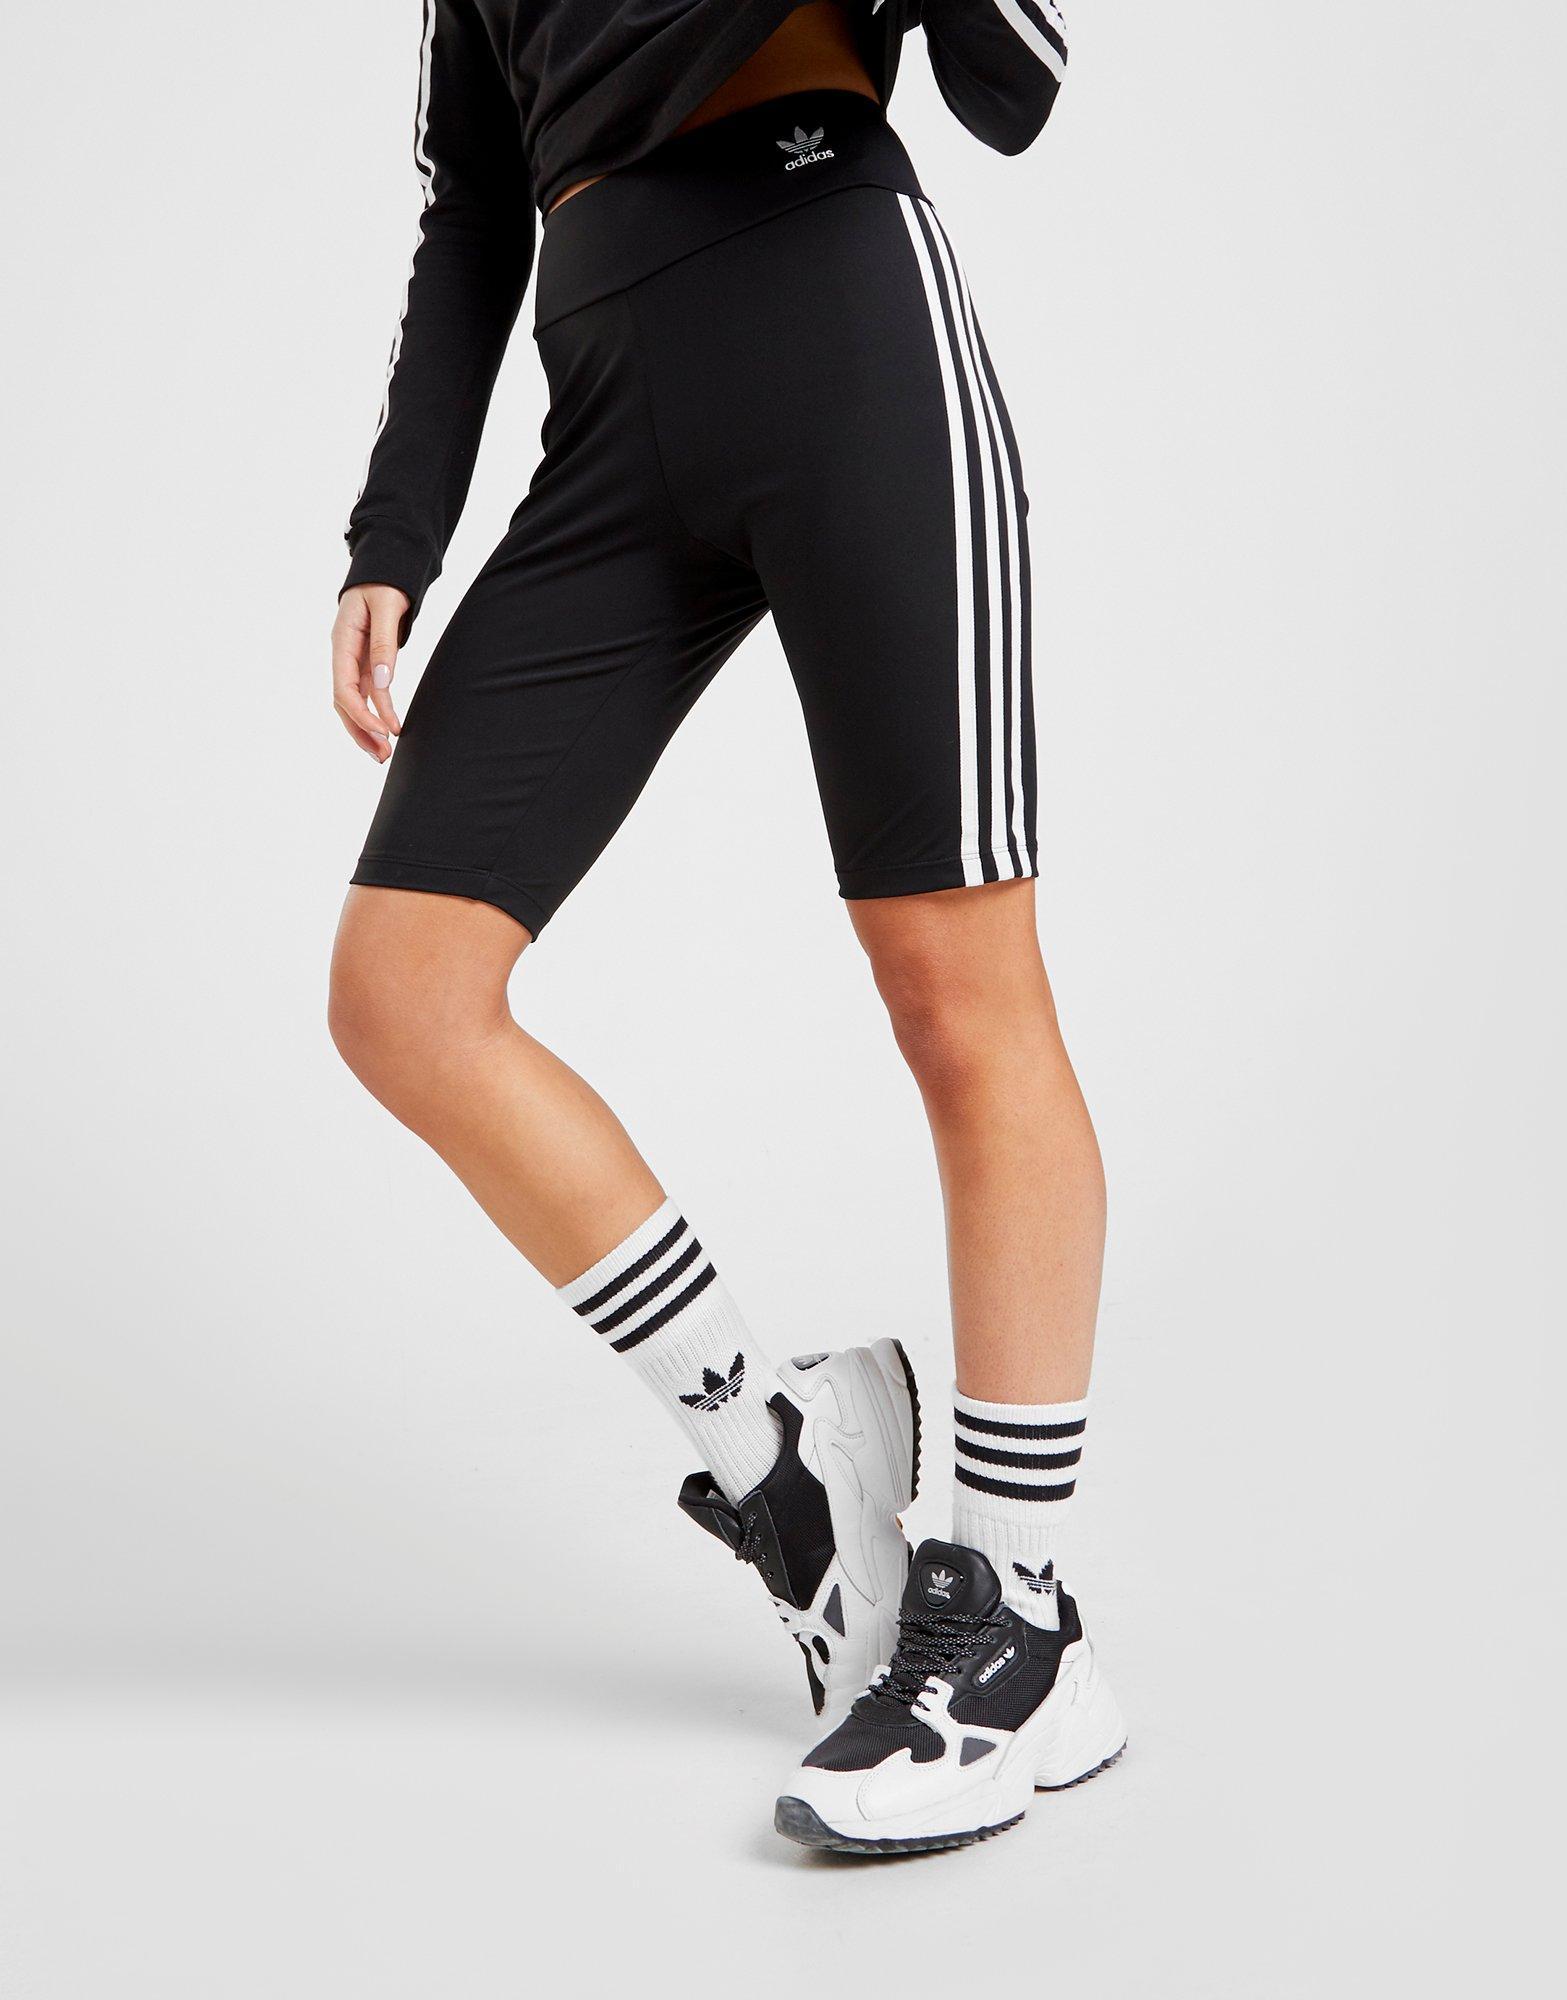 adidas high waisted shorts